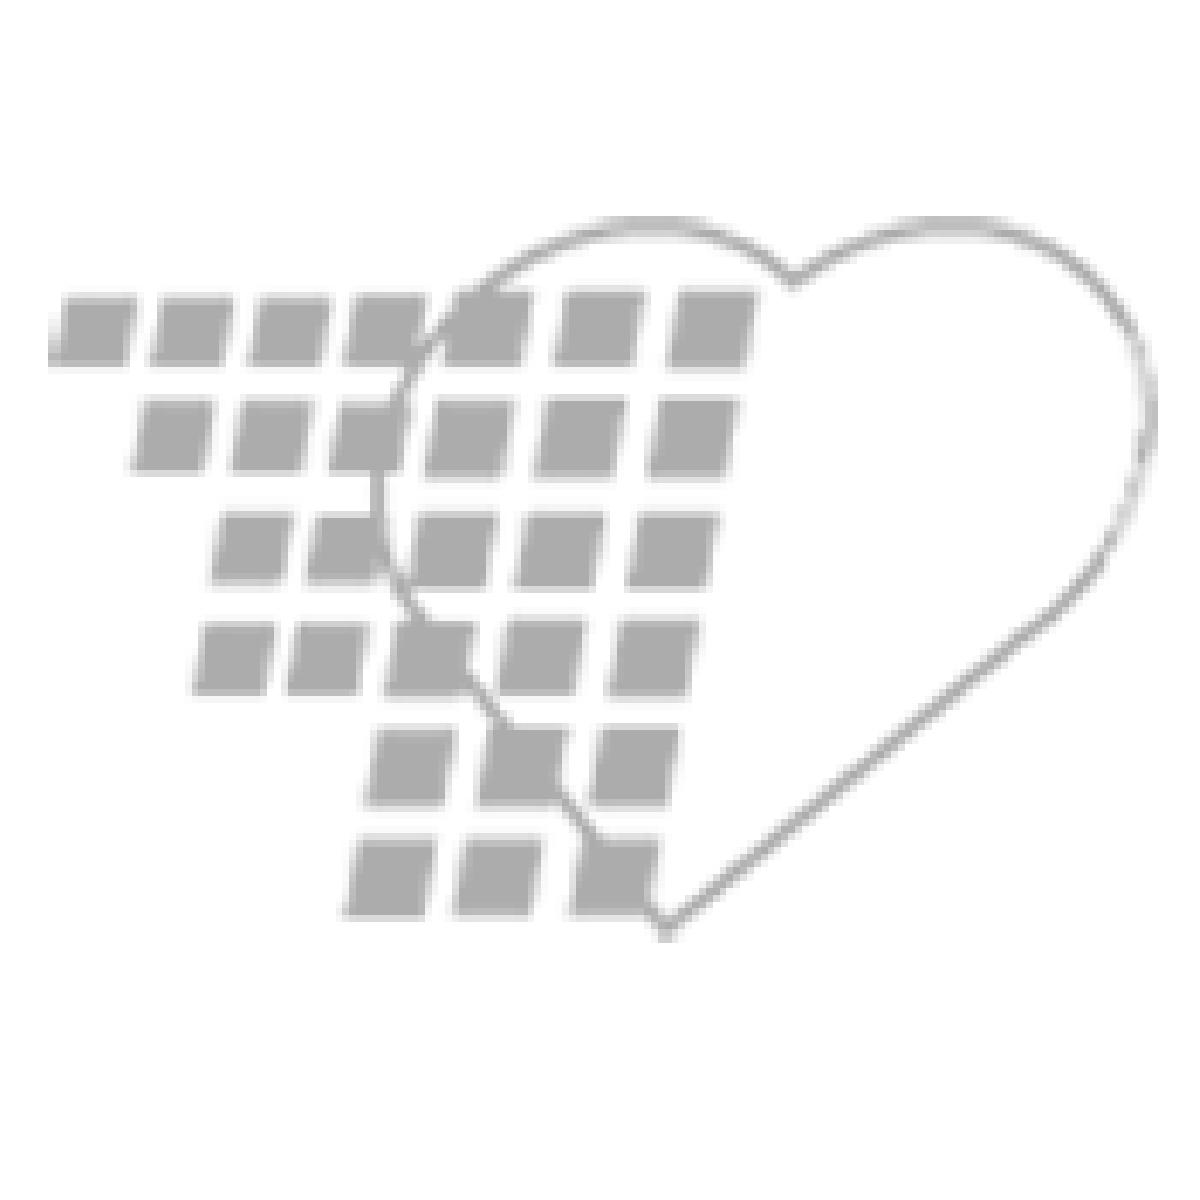 03-32-2480 - SaniGuard® Dry On Contact Sanitizing Spray - (ships ORMD)